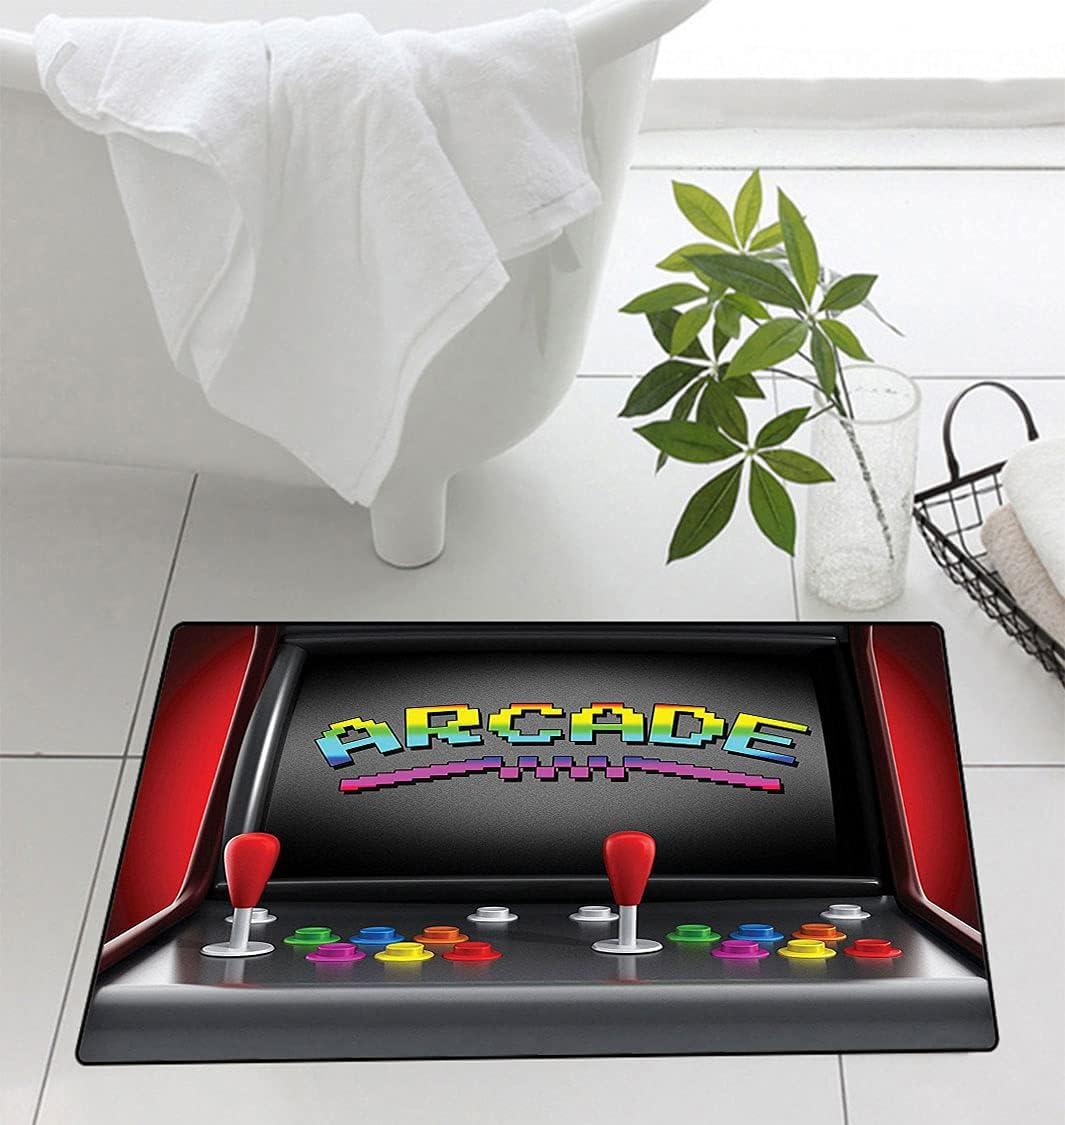 Oklahoma City Recommended Mall Arcade Games Doormat Machine Retro Butt Game Fun Joystick